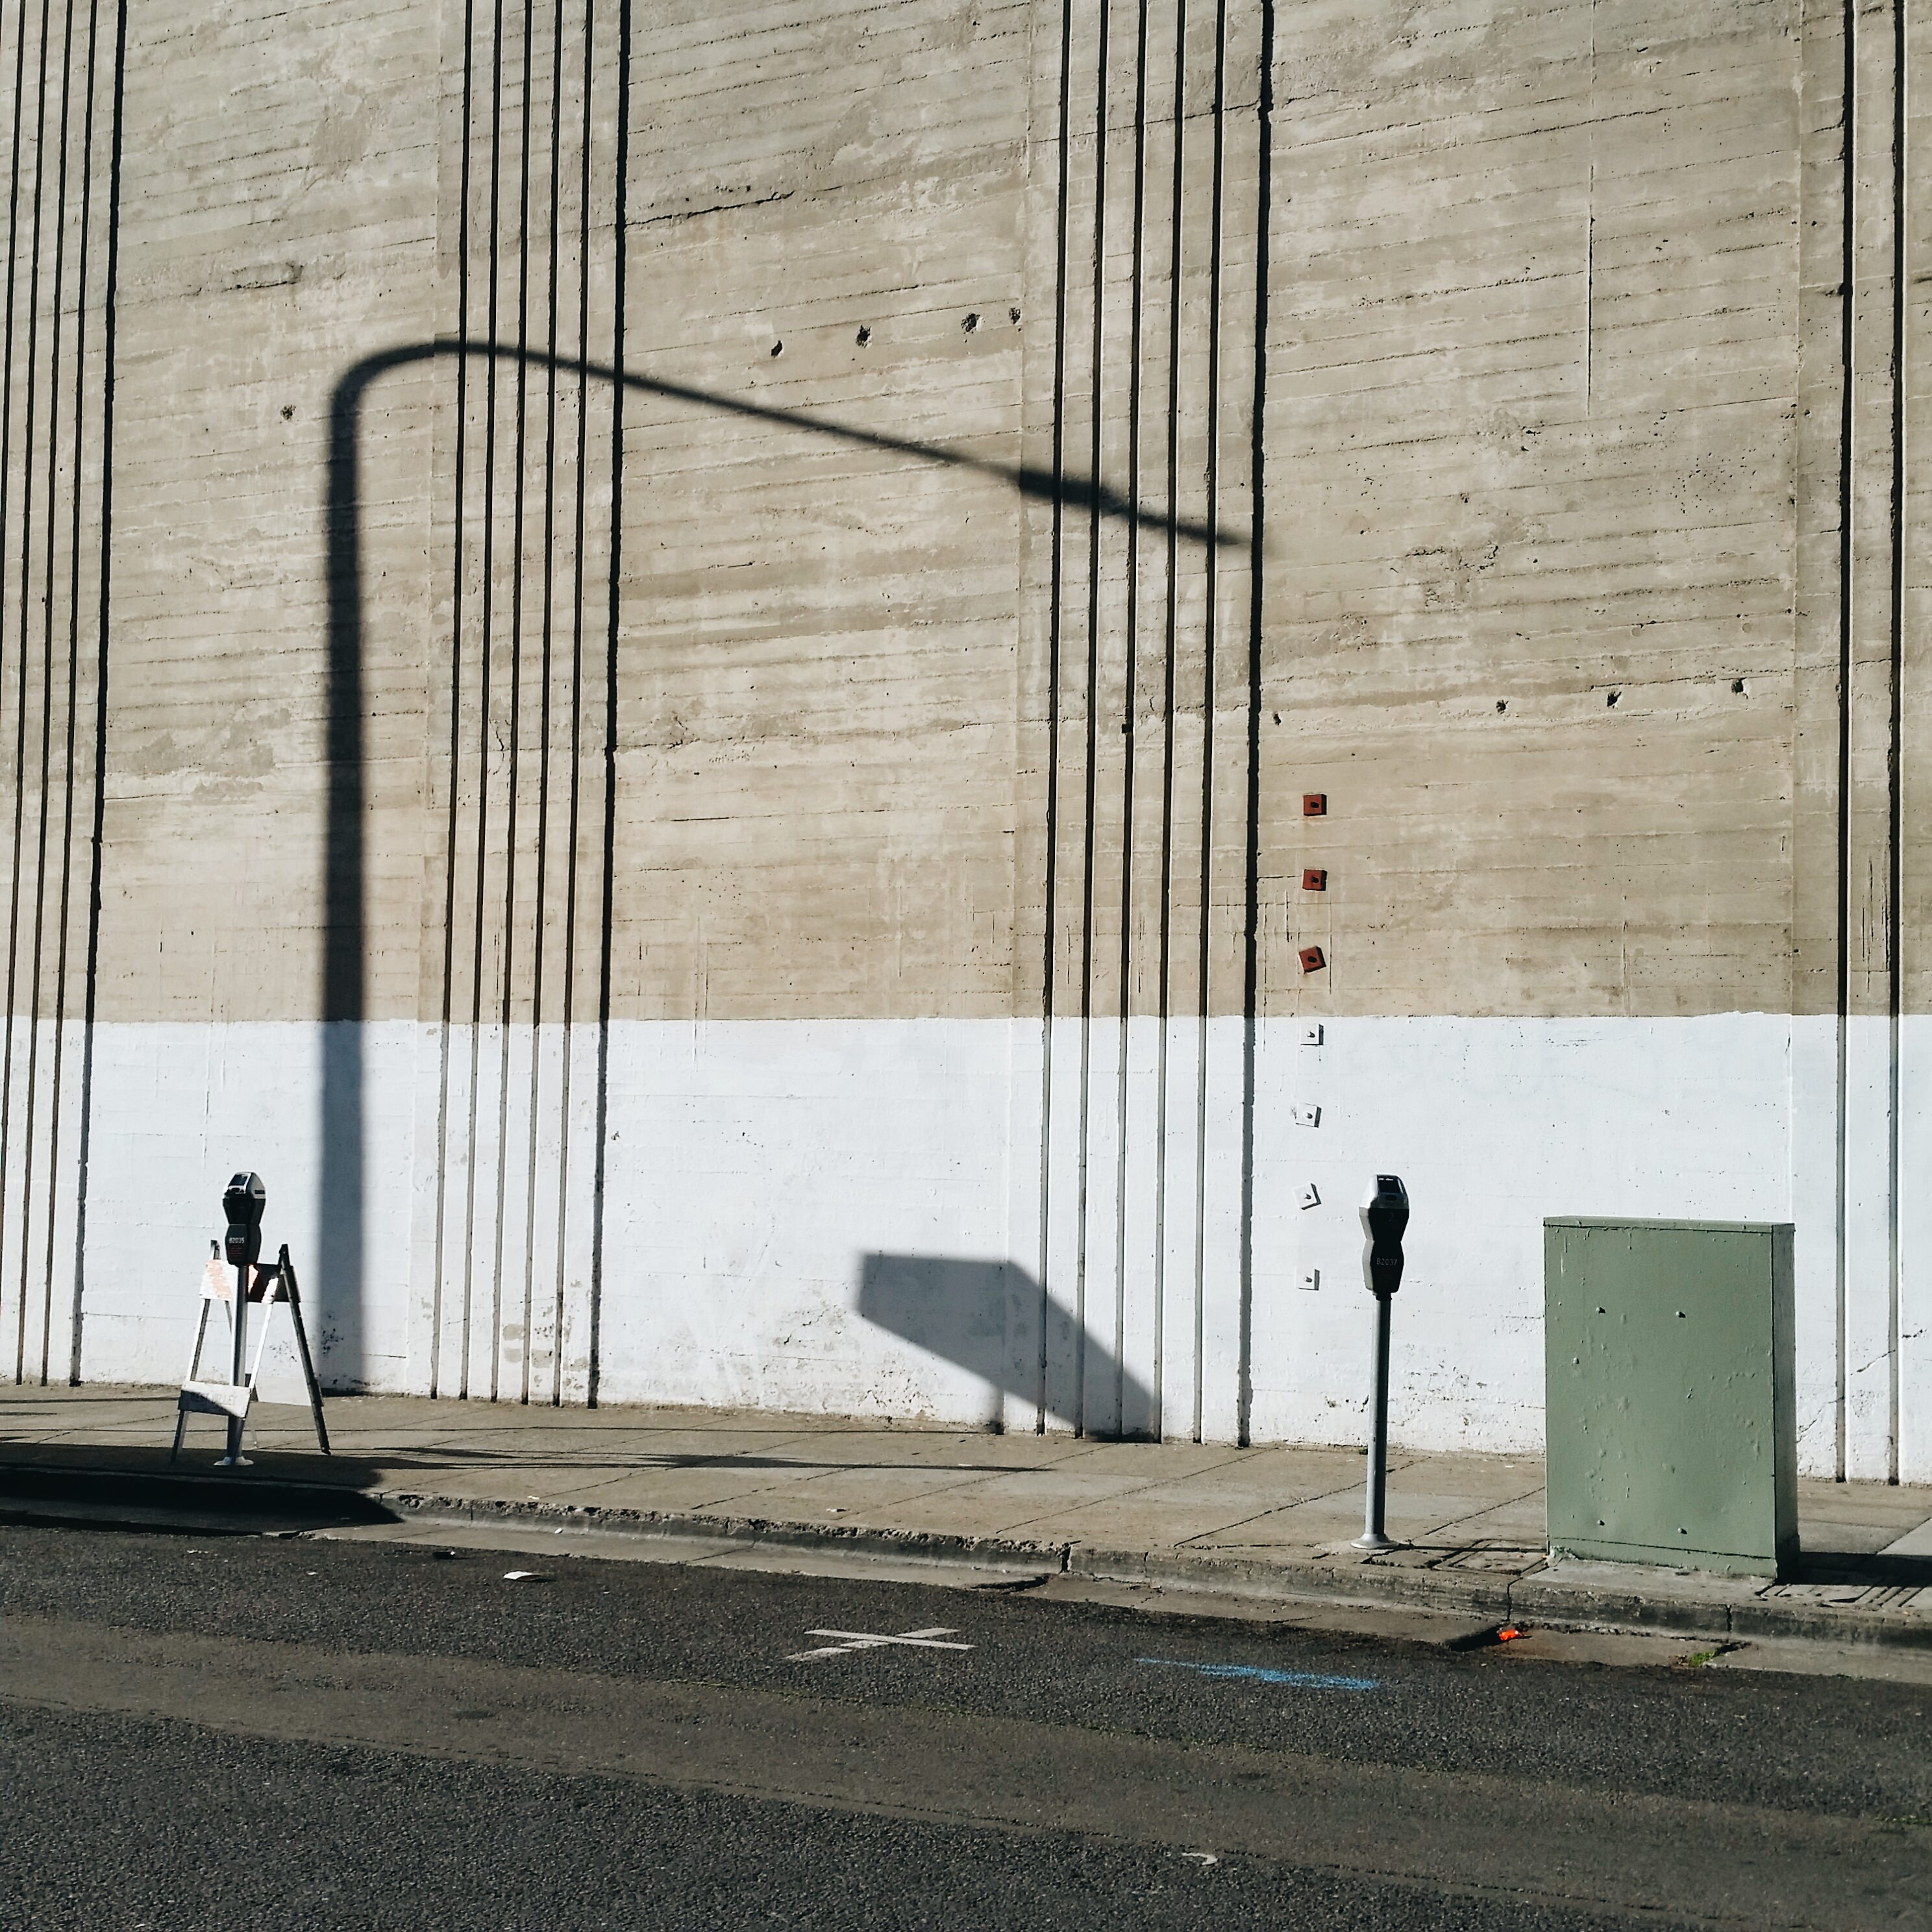 Urban landscape. Berkeley, 2015. Telephone pole.